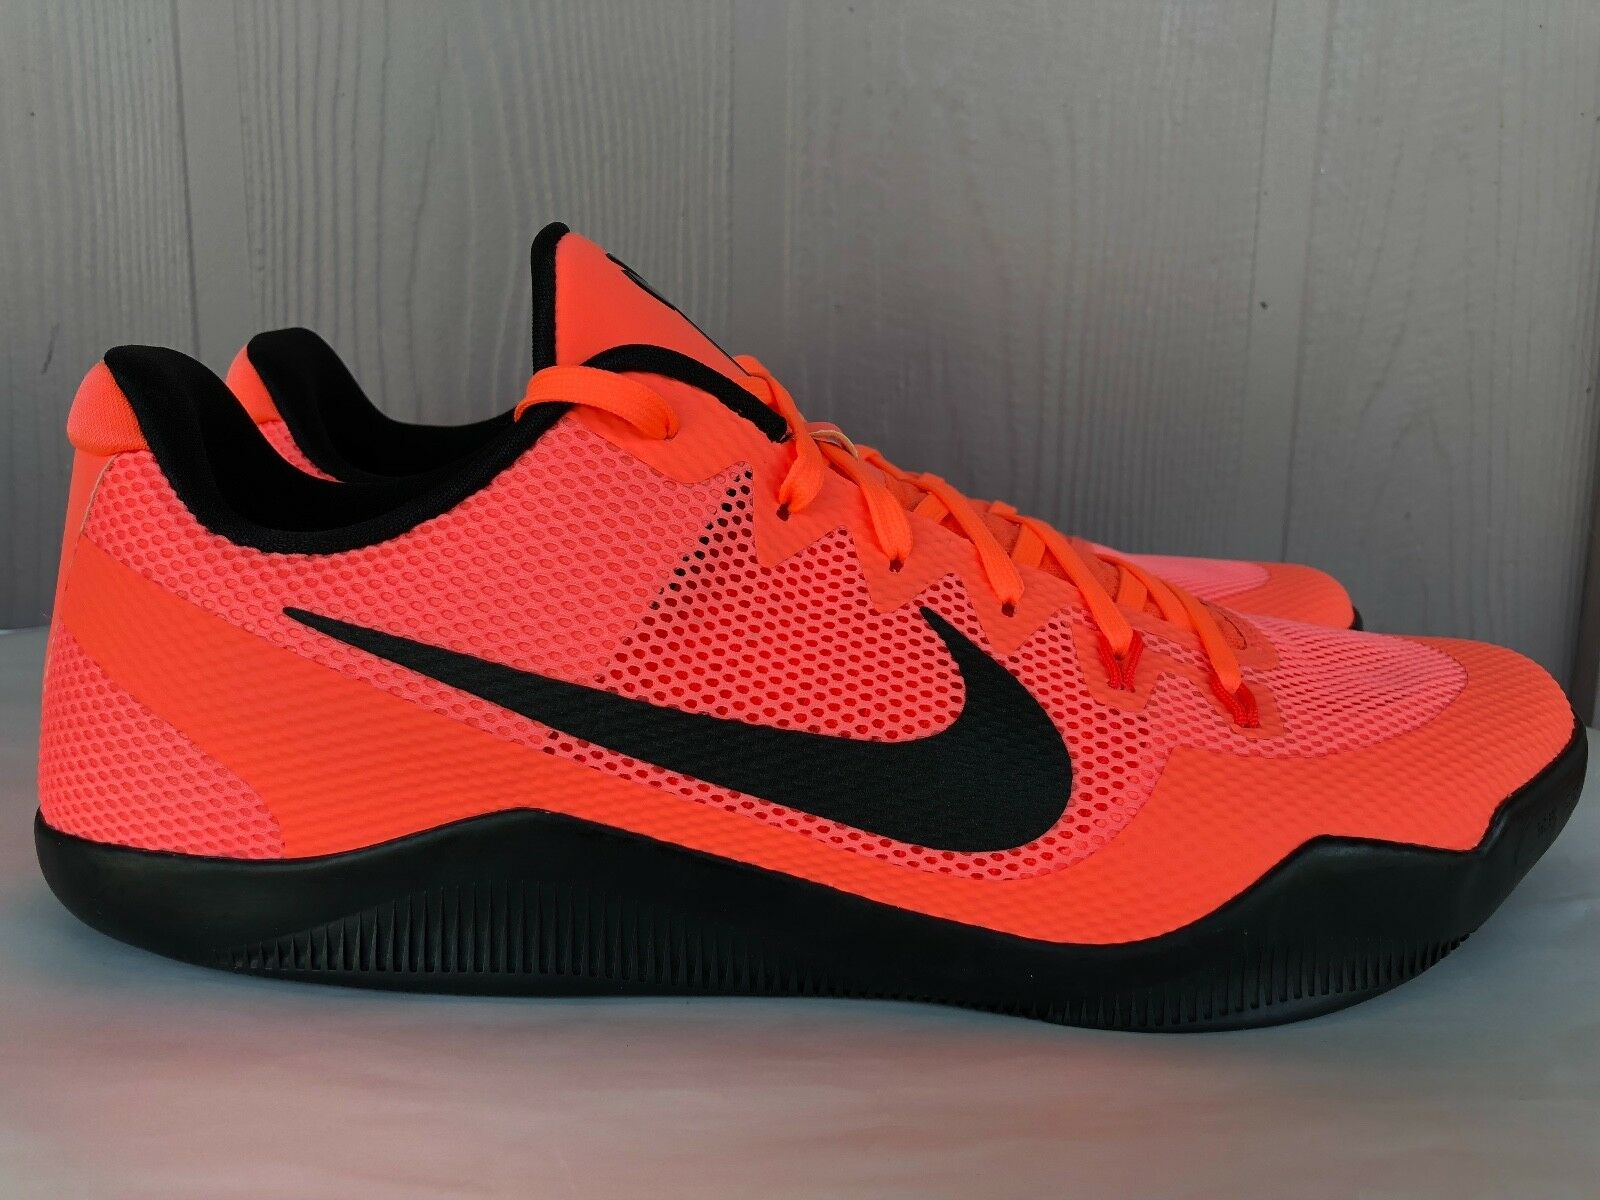 Bright Hommes Xi Nike Kobe 806 Mango 836183 Barcelona Zoom wqOSzw0